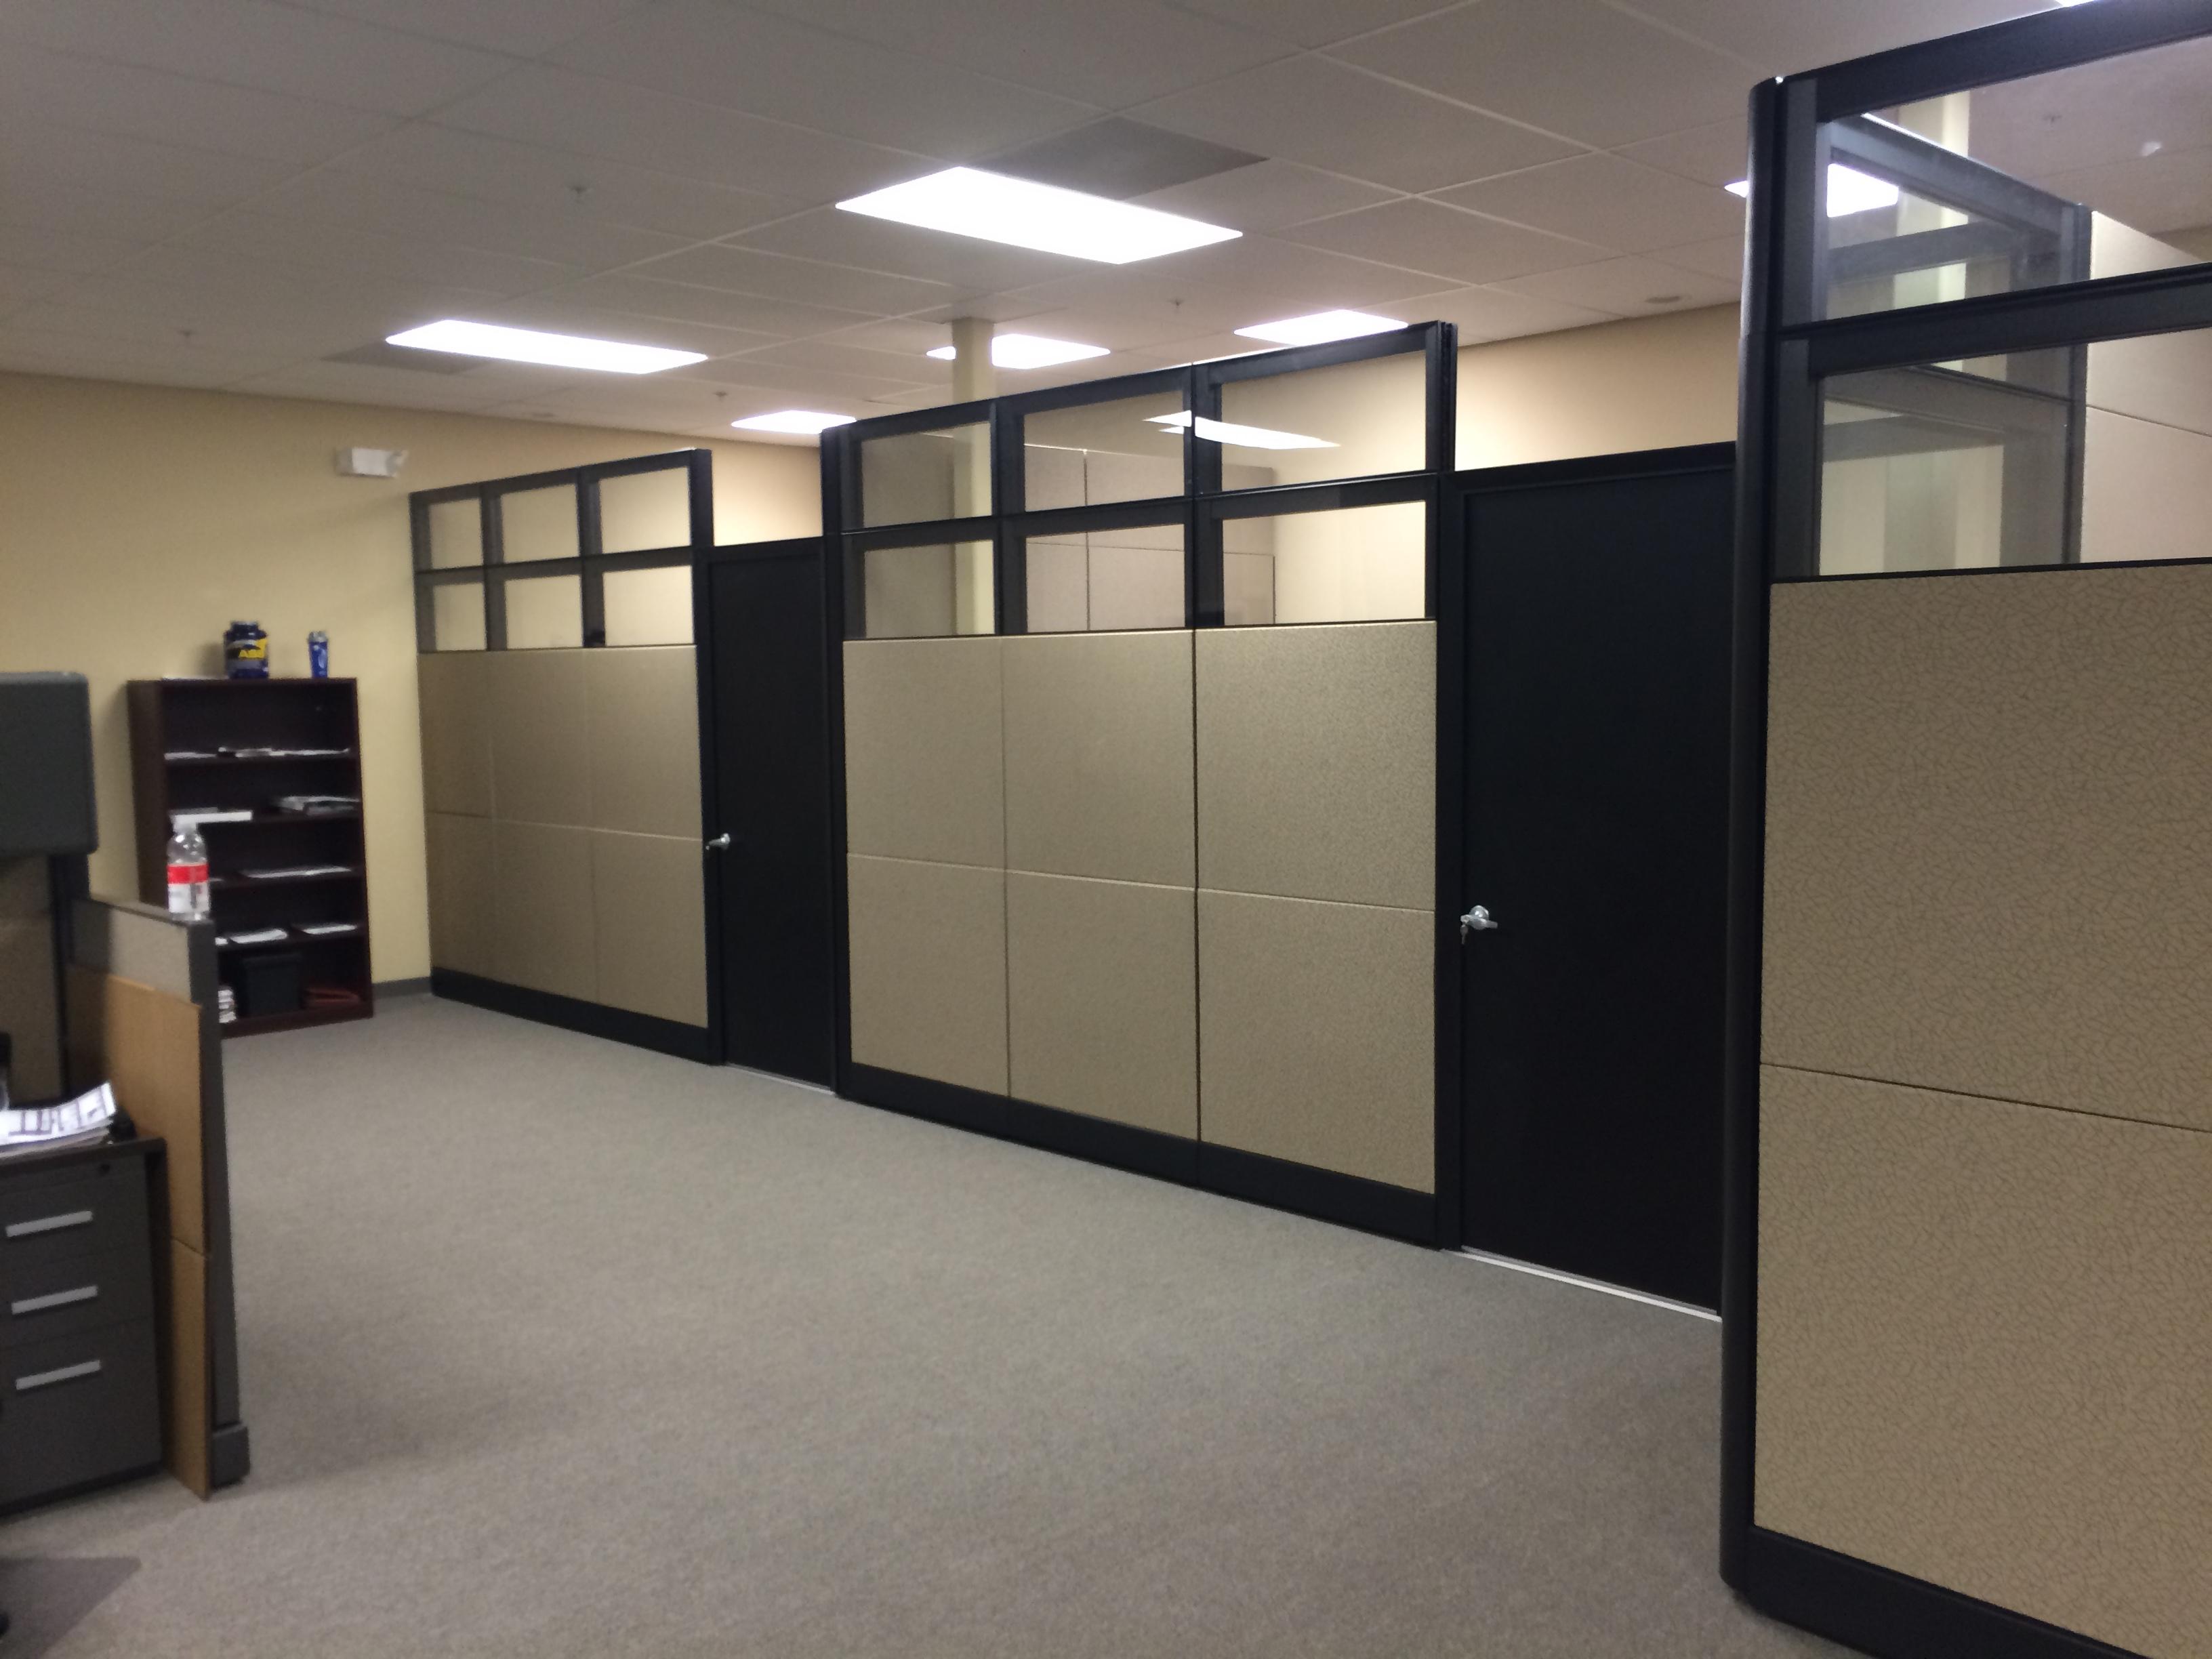 manasota-office-supplies-llc-20170320-172631-7-.jpg